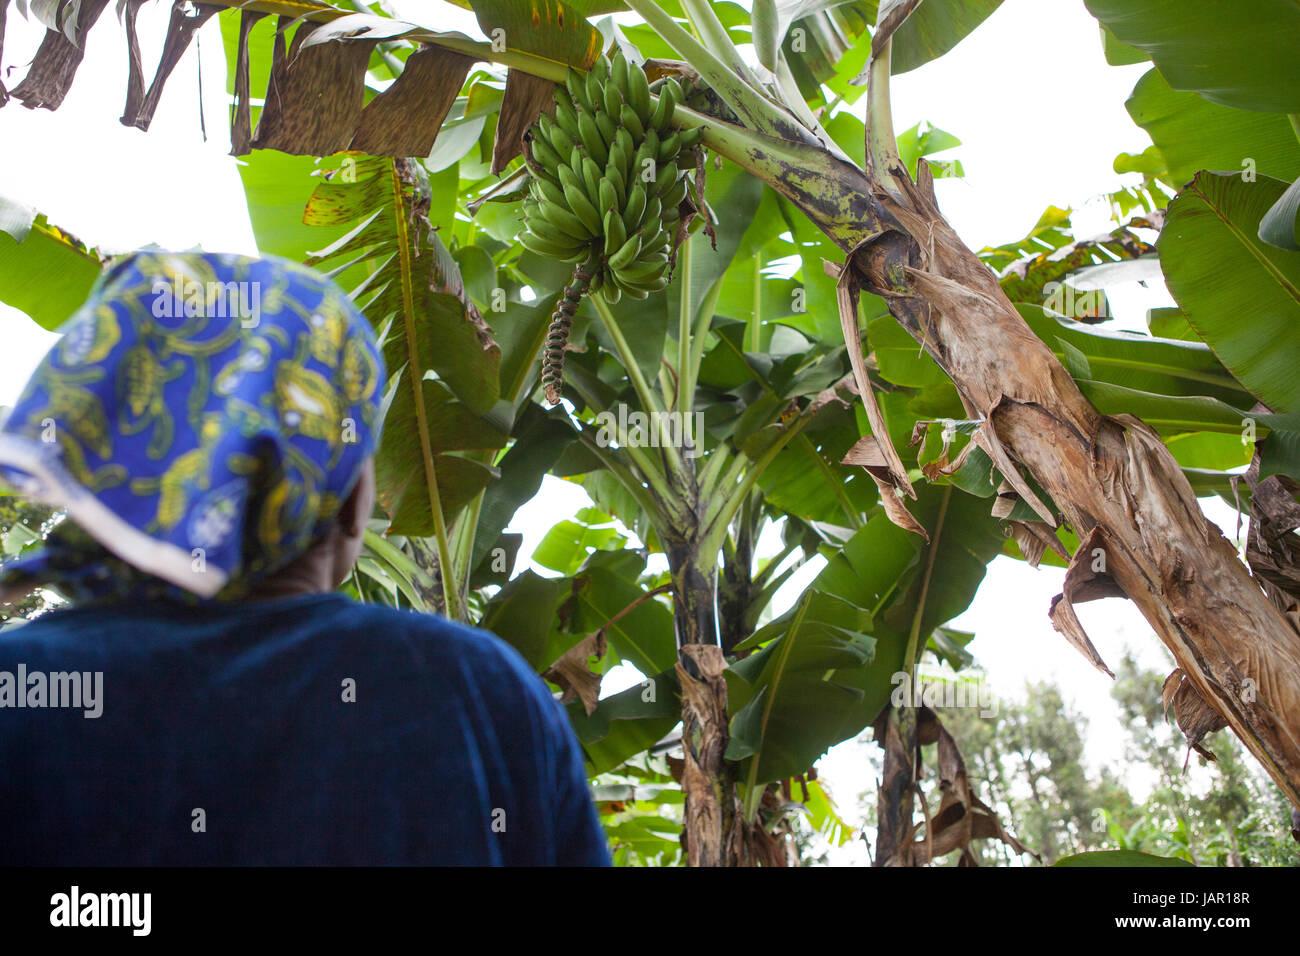 fruit farm africa stockfotos fruit farm africa bilder alamy. Black Bedroom Furniture Sets. Home Design Ideas